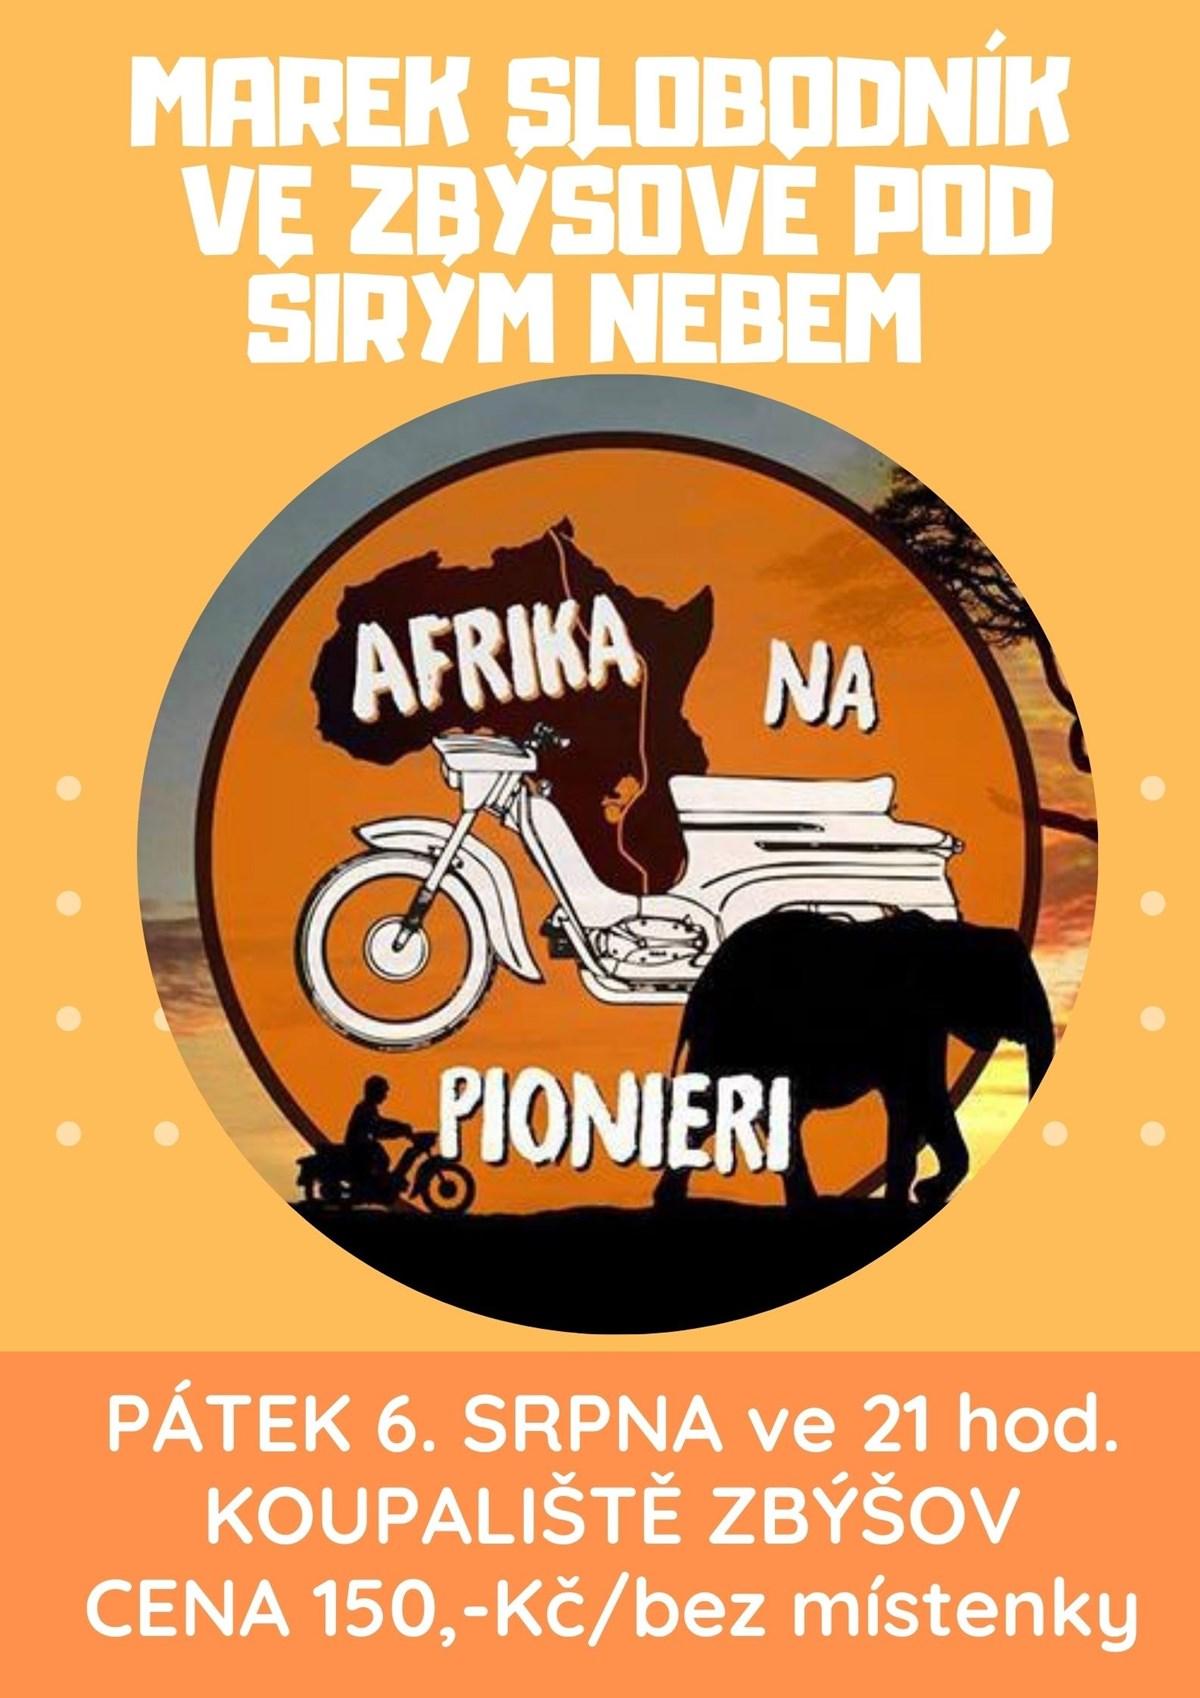 Afrika na pioneri